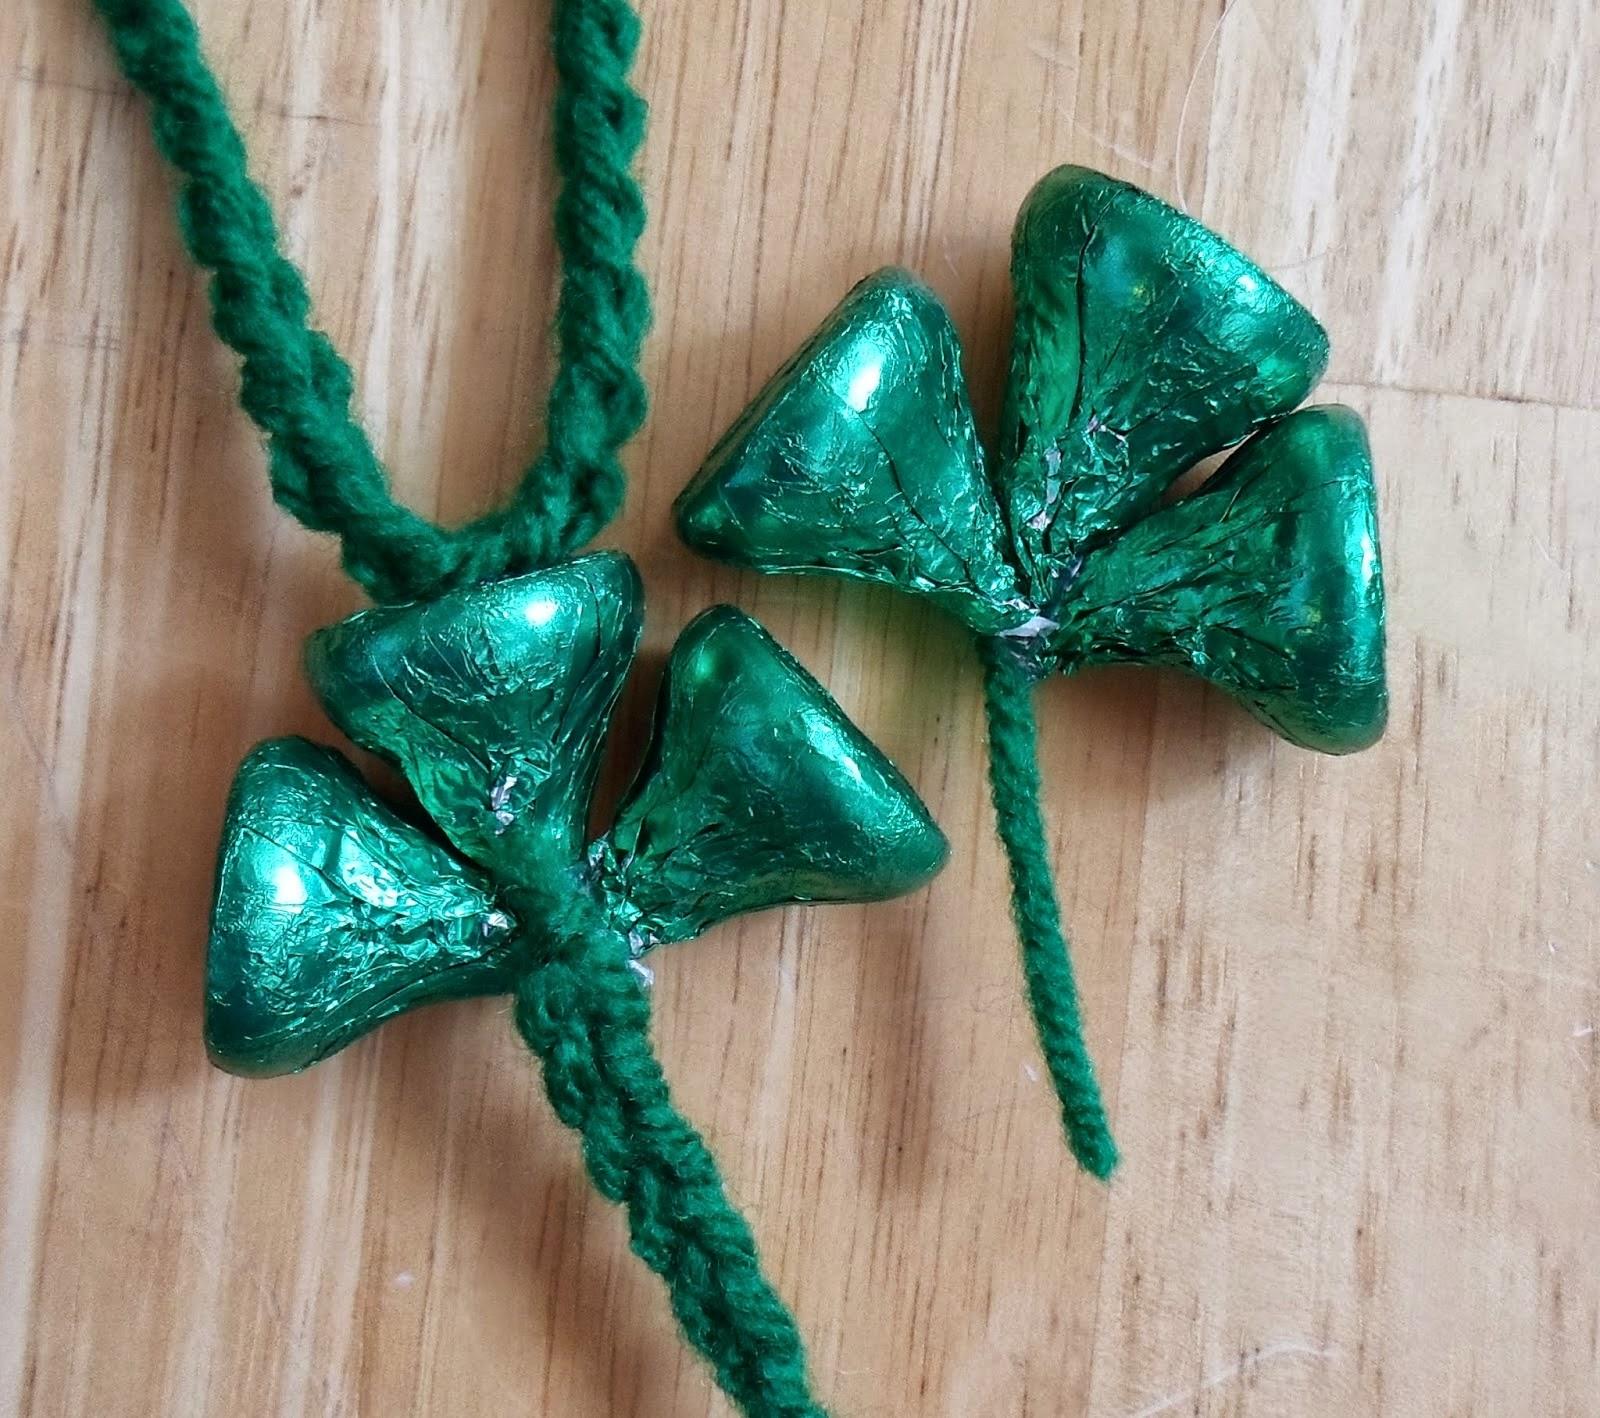 http://happierthanapiginmud.blogspot.com/2015/02/hershey-kiss-shamrock-necklace-or.html